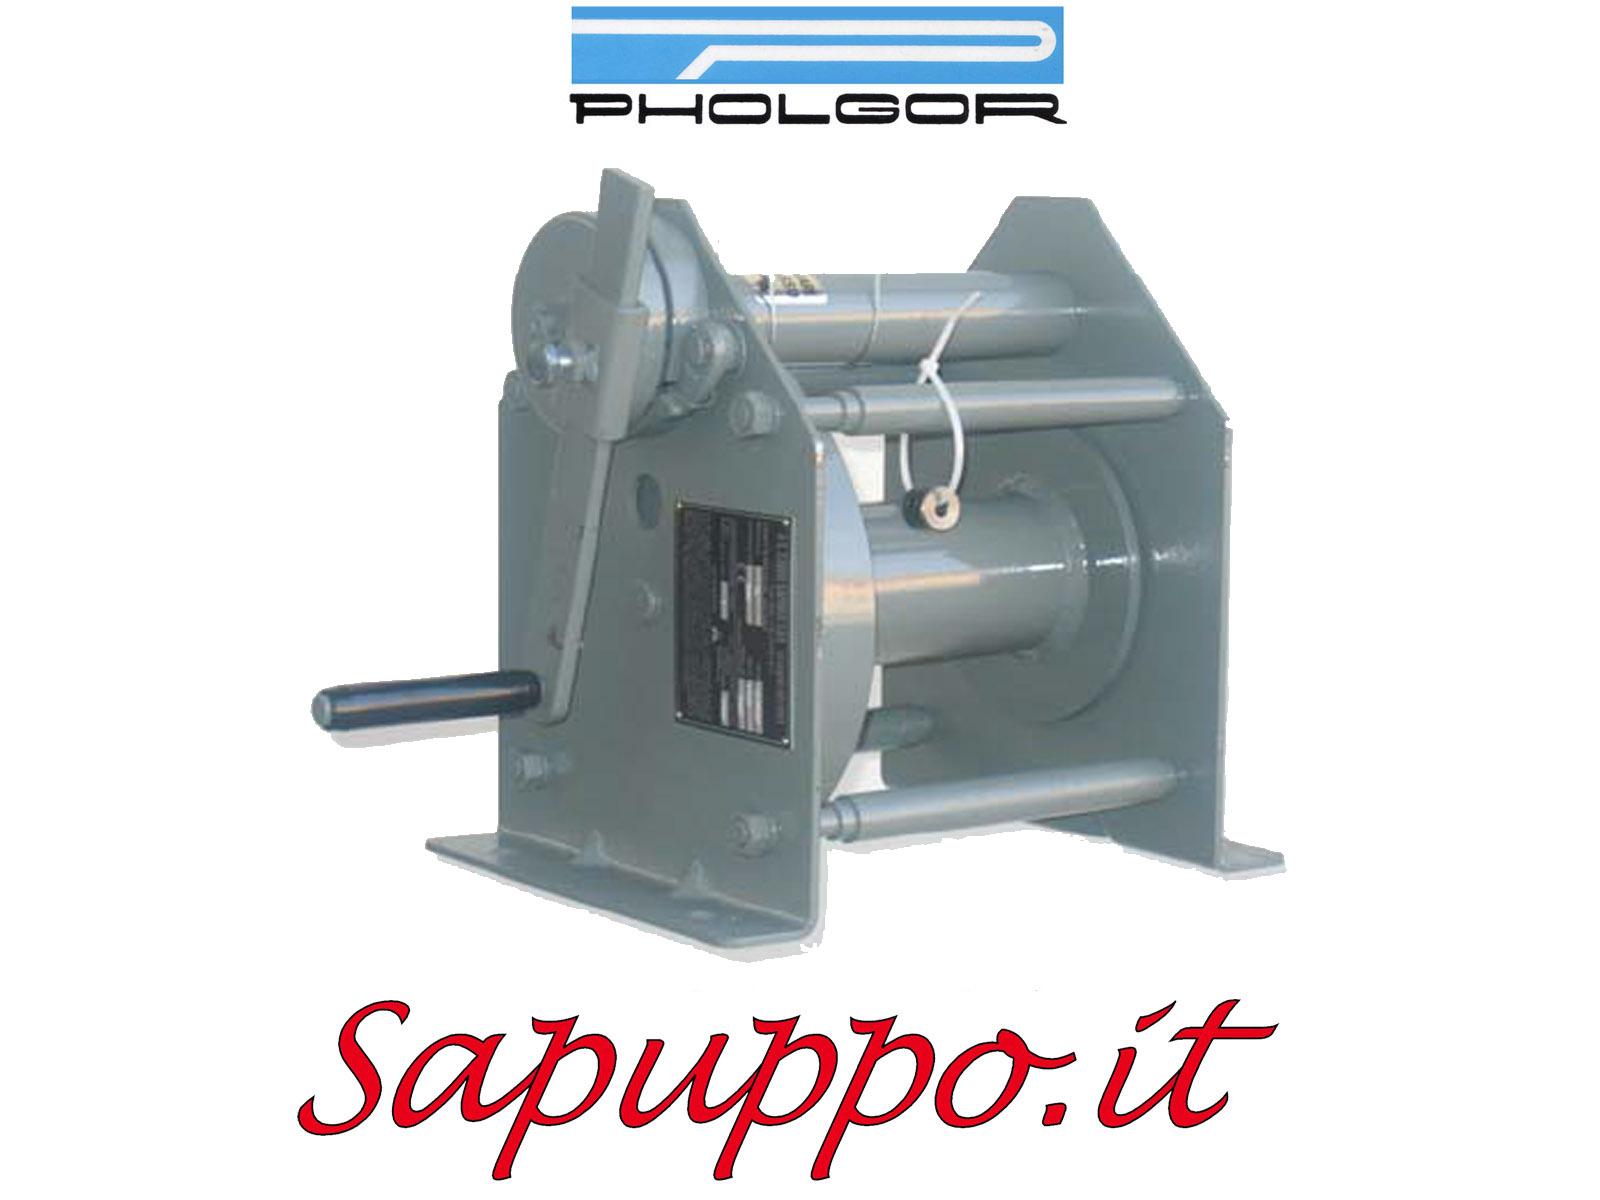 Argano a mano ad ingranaggi cilindrici tipo CLM - PHOLGOR